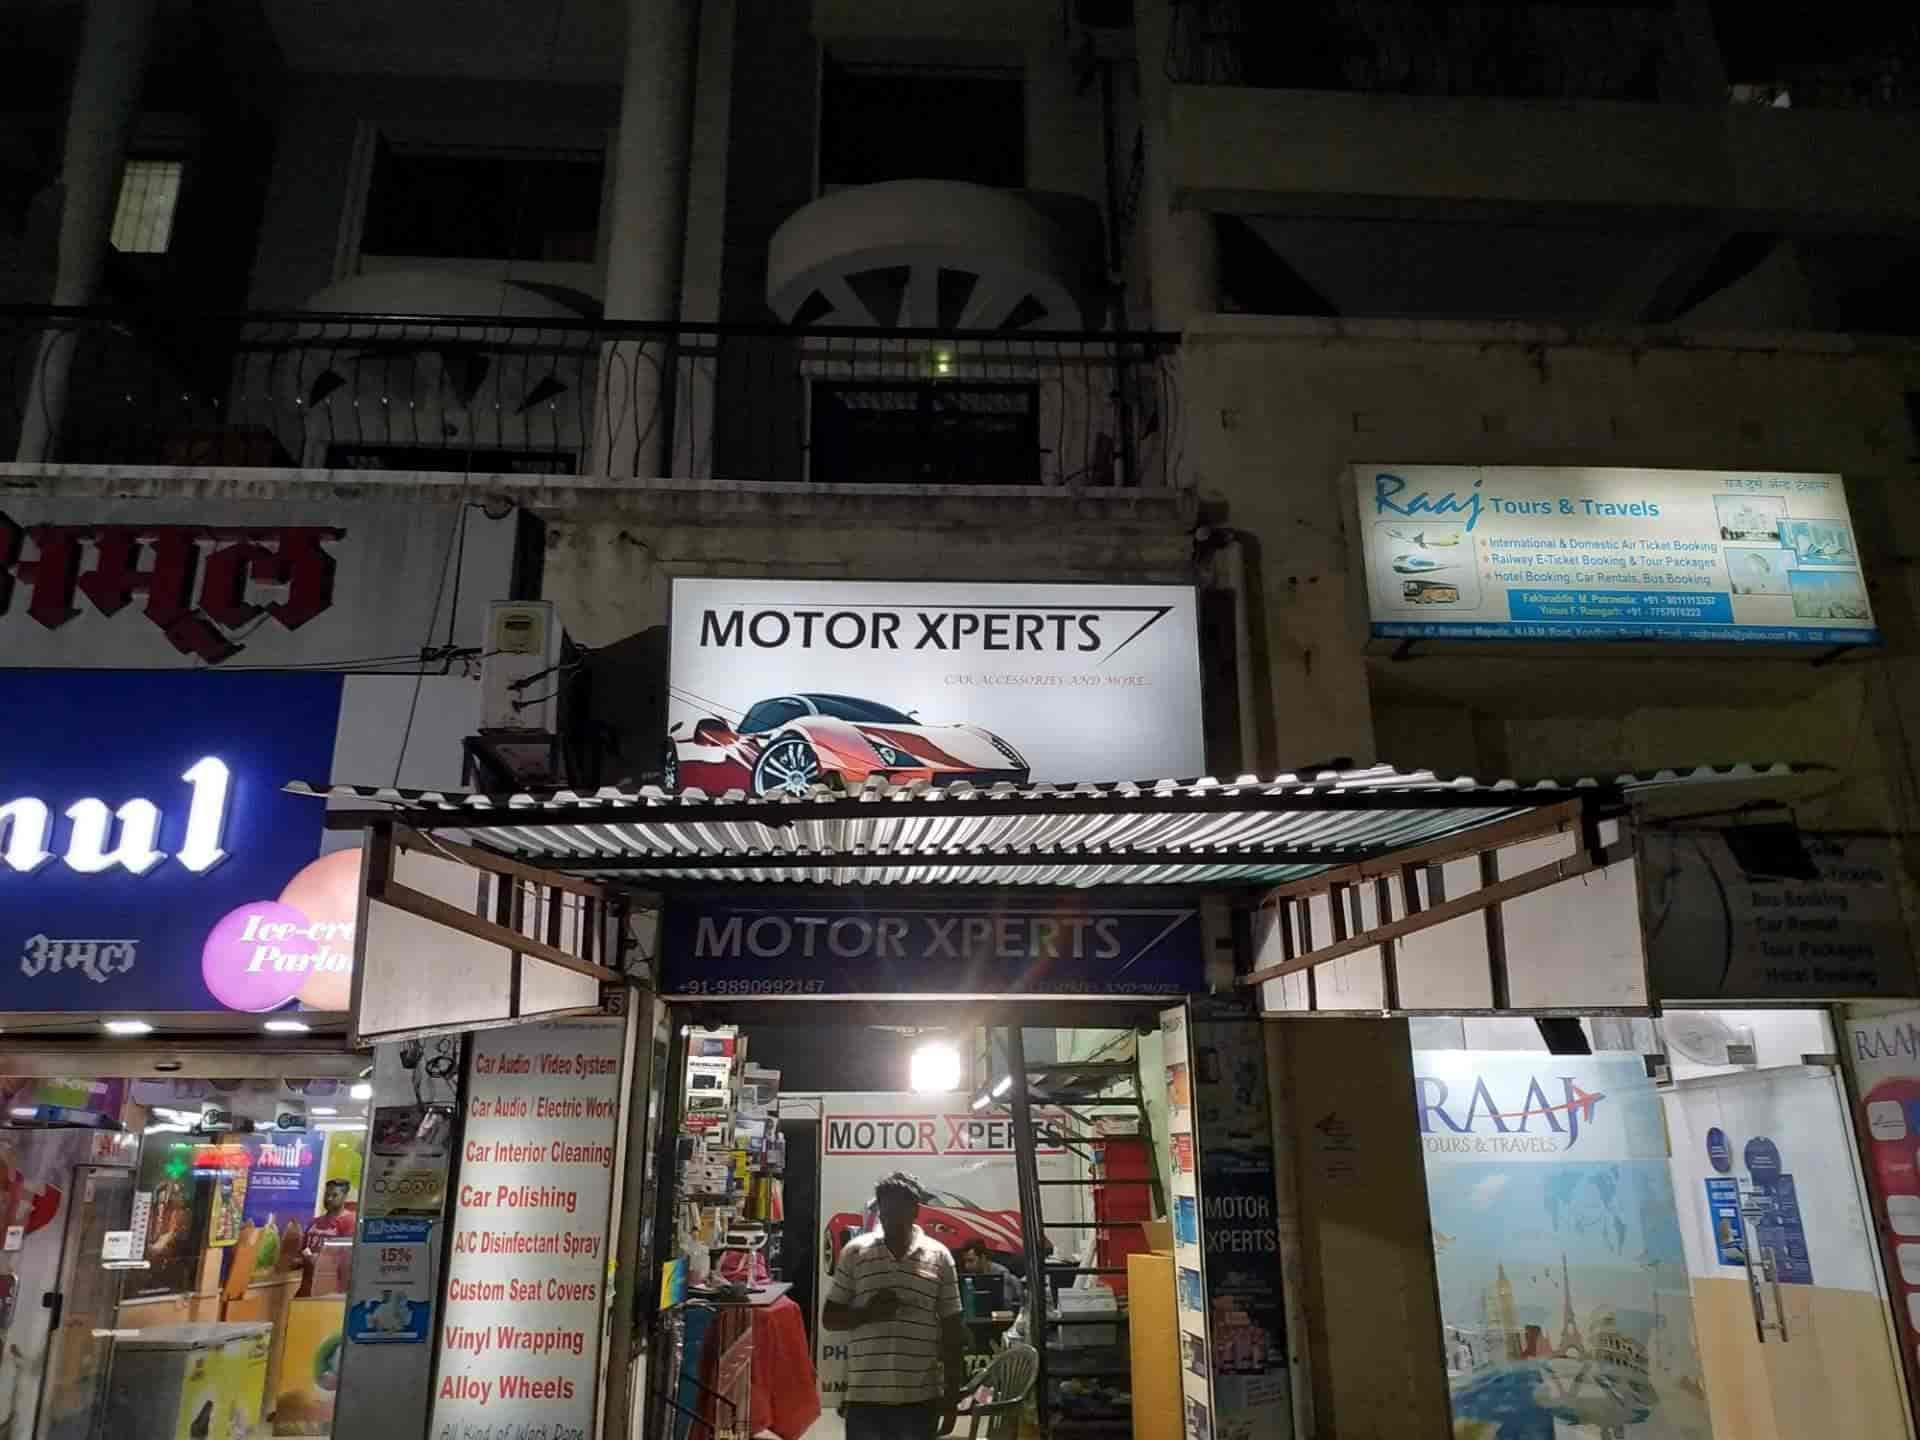 Moter Xperts Kondhwa Khurd Car Accessory Dealers In Pune Justdial